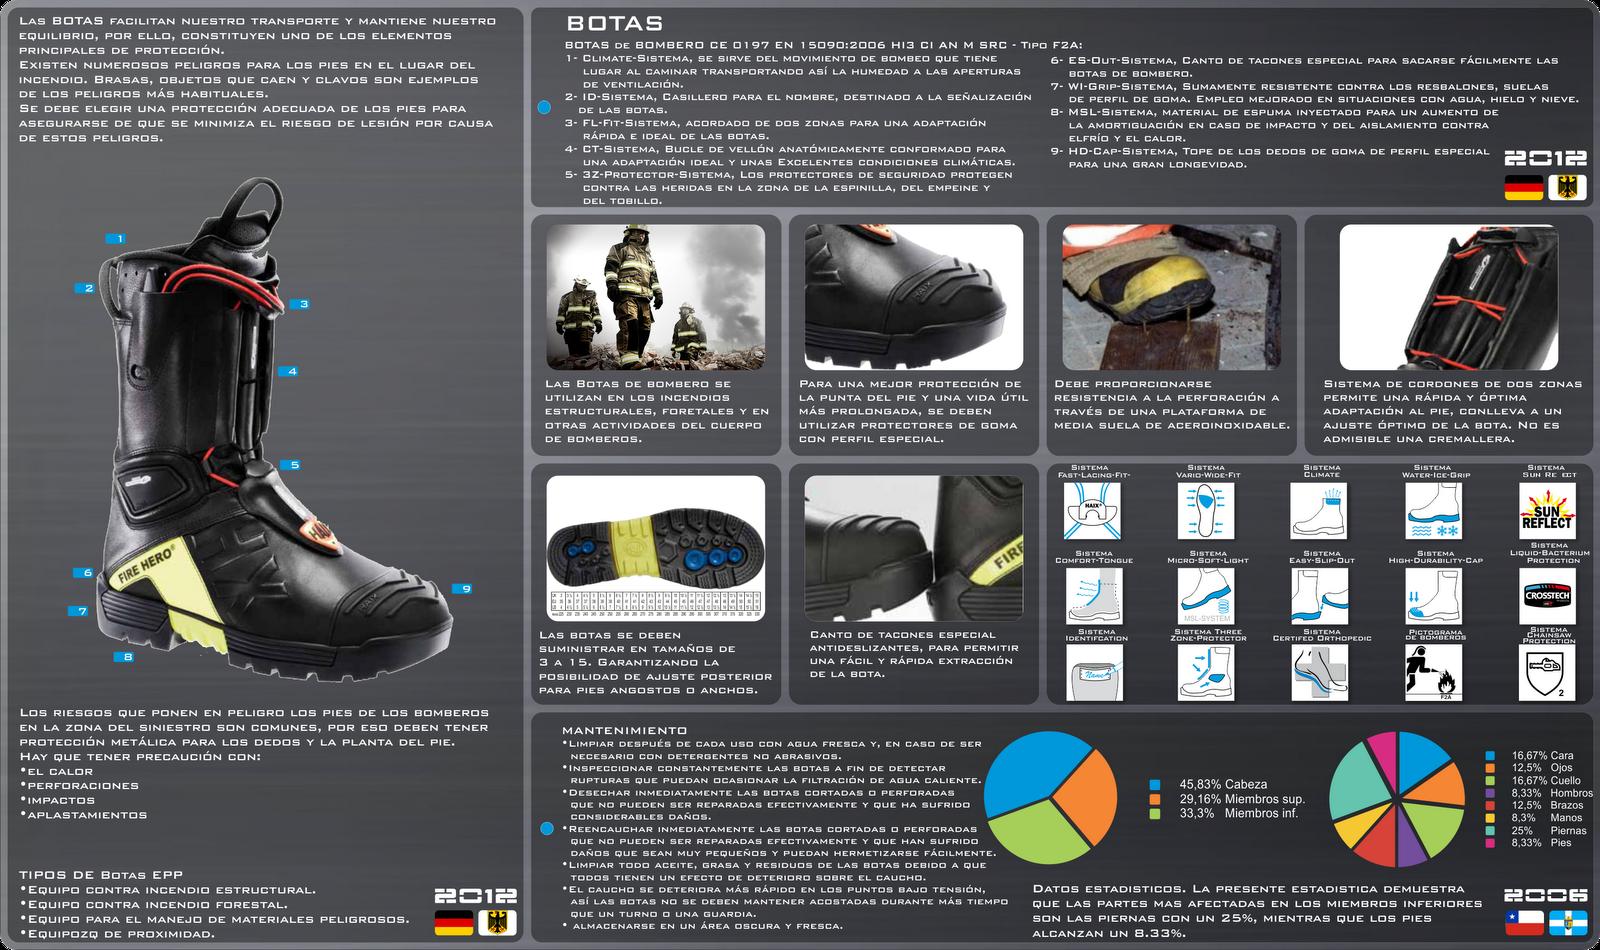 http   www.slideshare.net ladycorpse epp-tipos-de-botas-de-seguridad-9346454 908b68a81245b